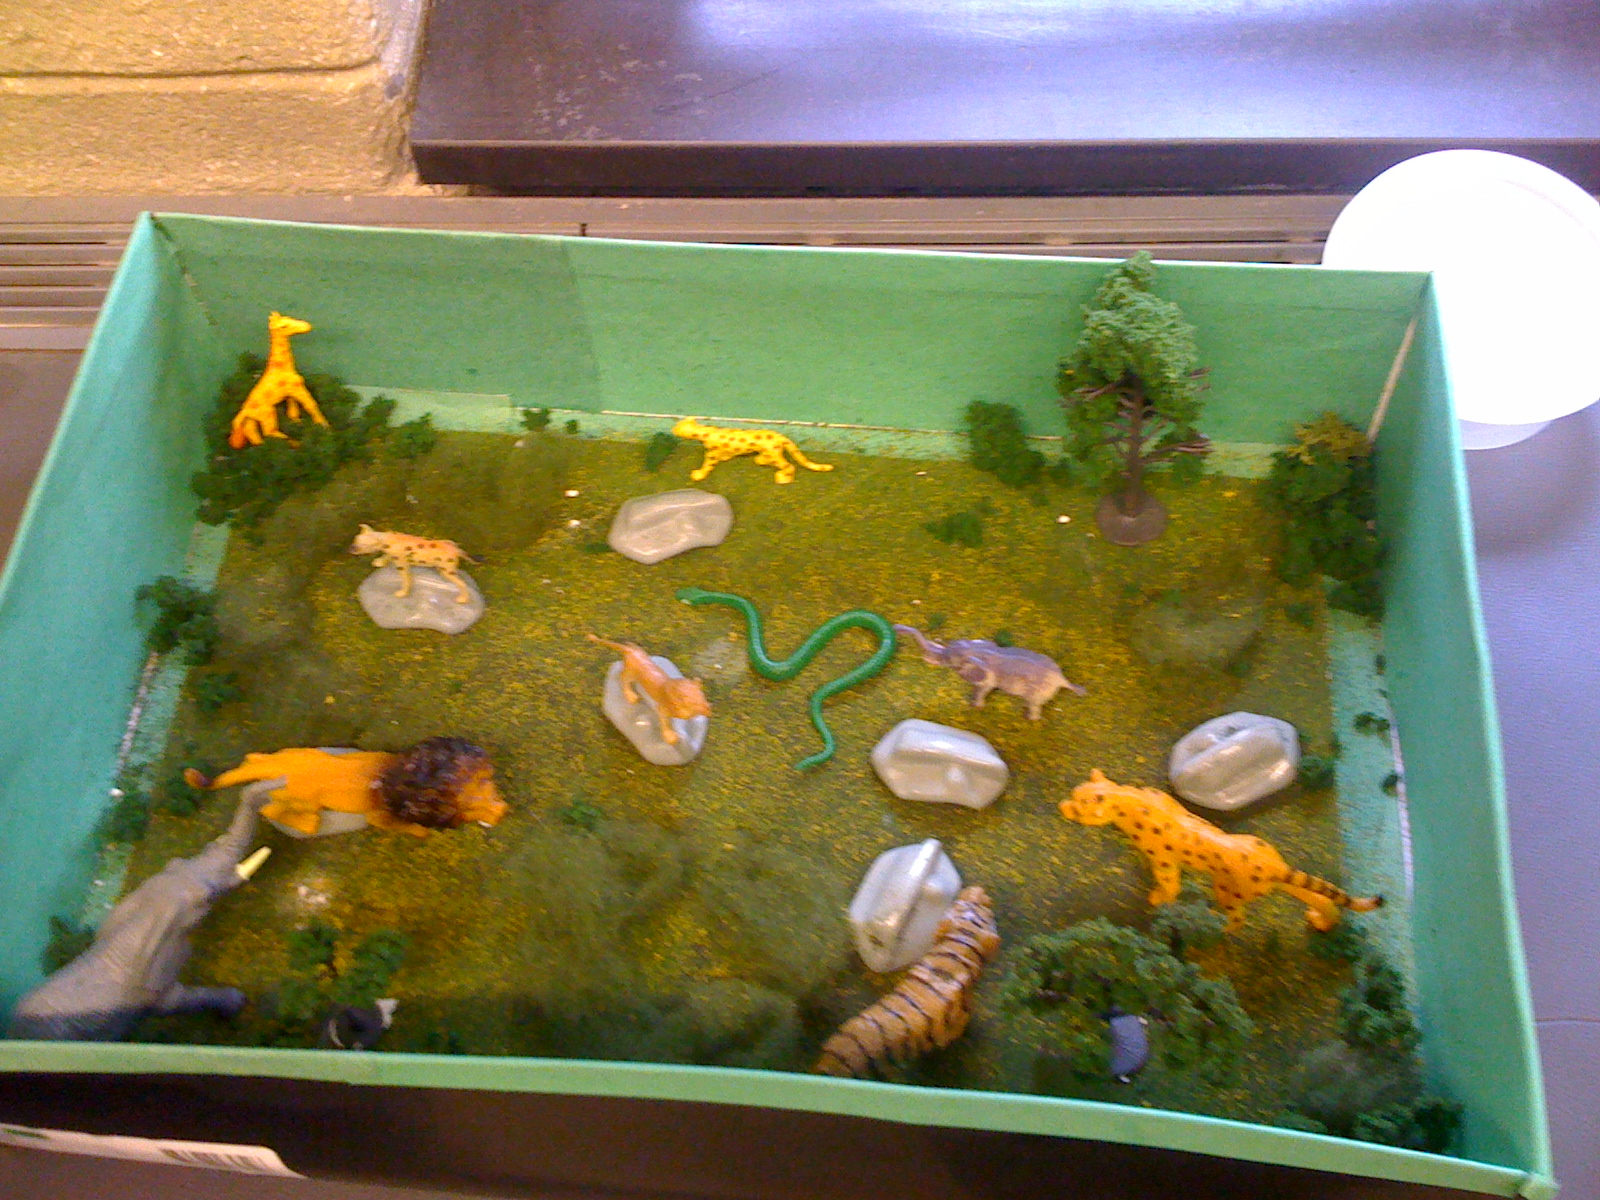 Images of Desert Ecosystem Diorama - #rock-cafe